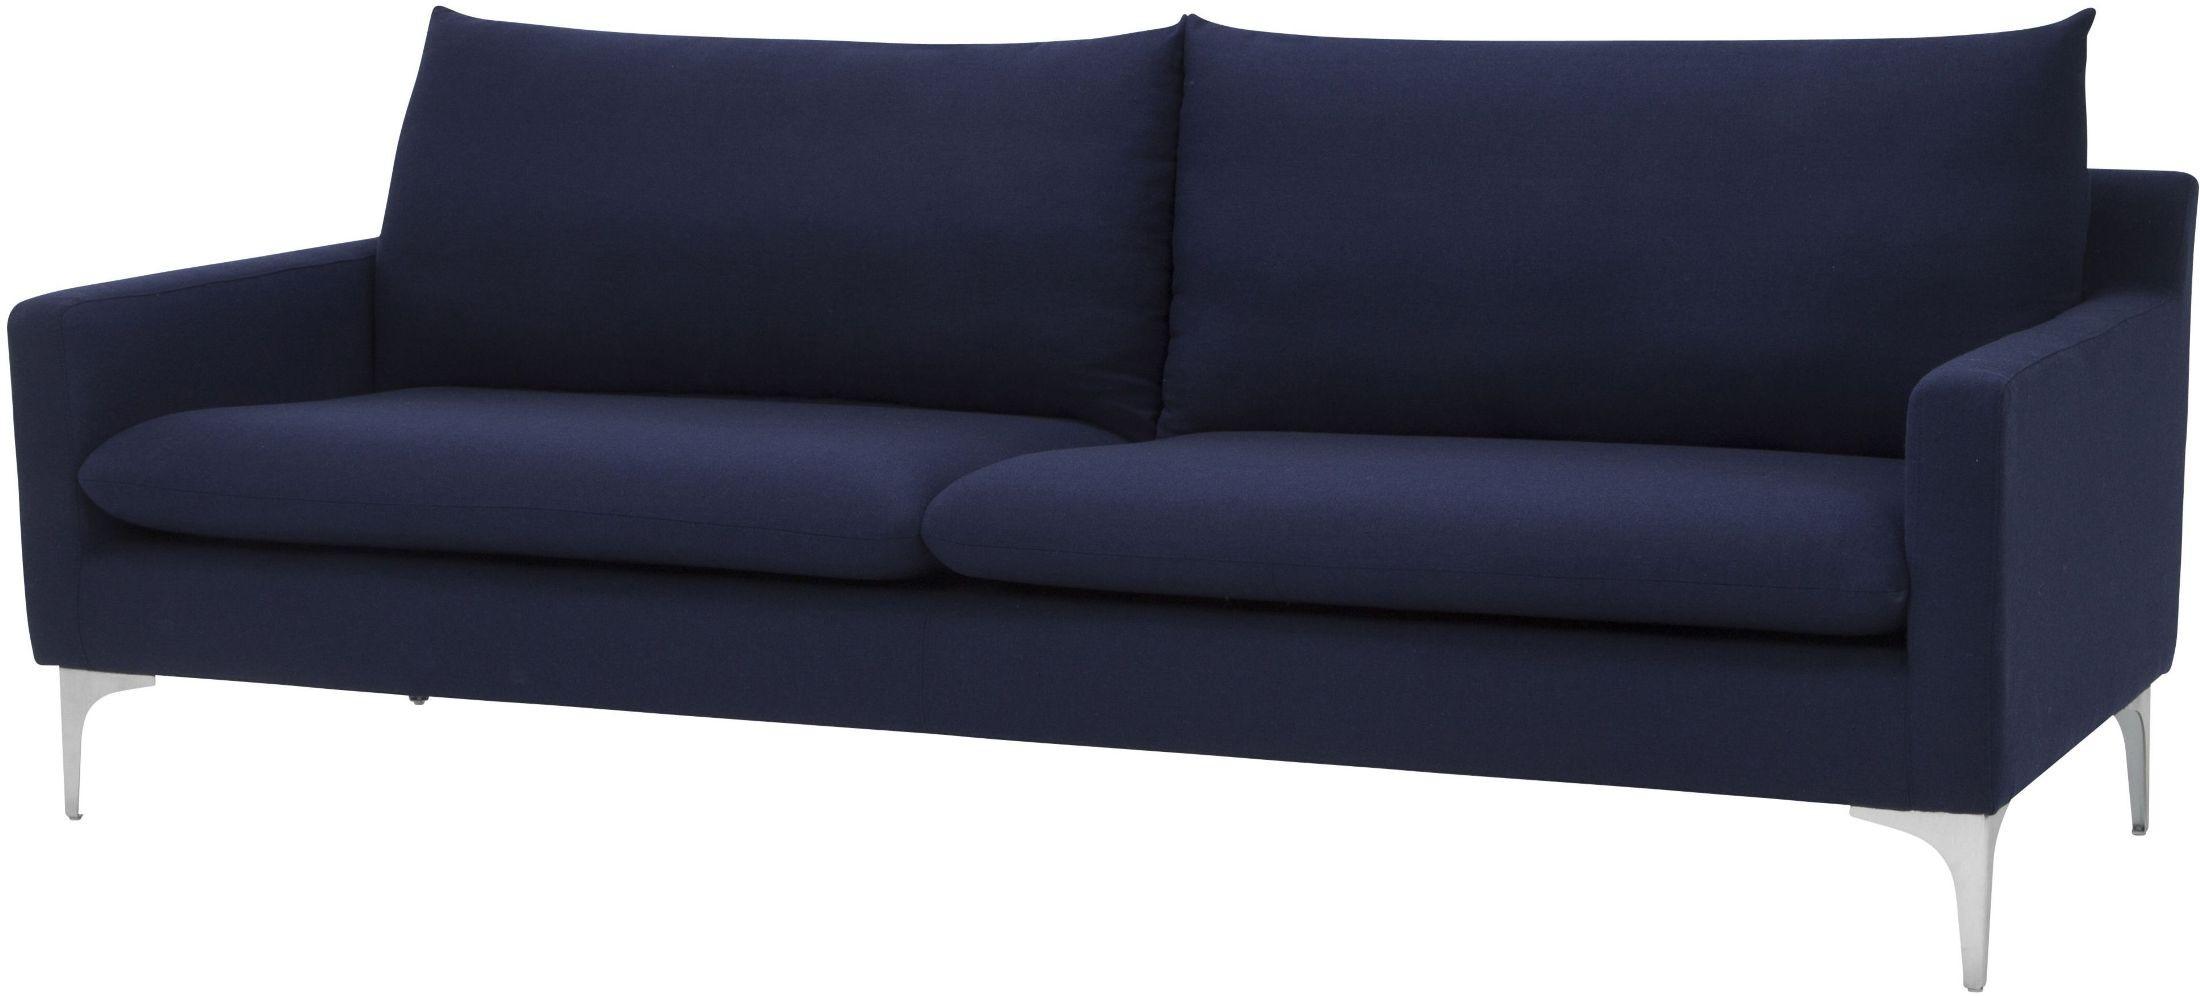 Anders Navy Blue Sofa Hgsc109 Nuevo